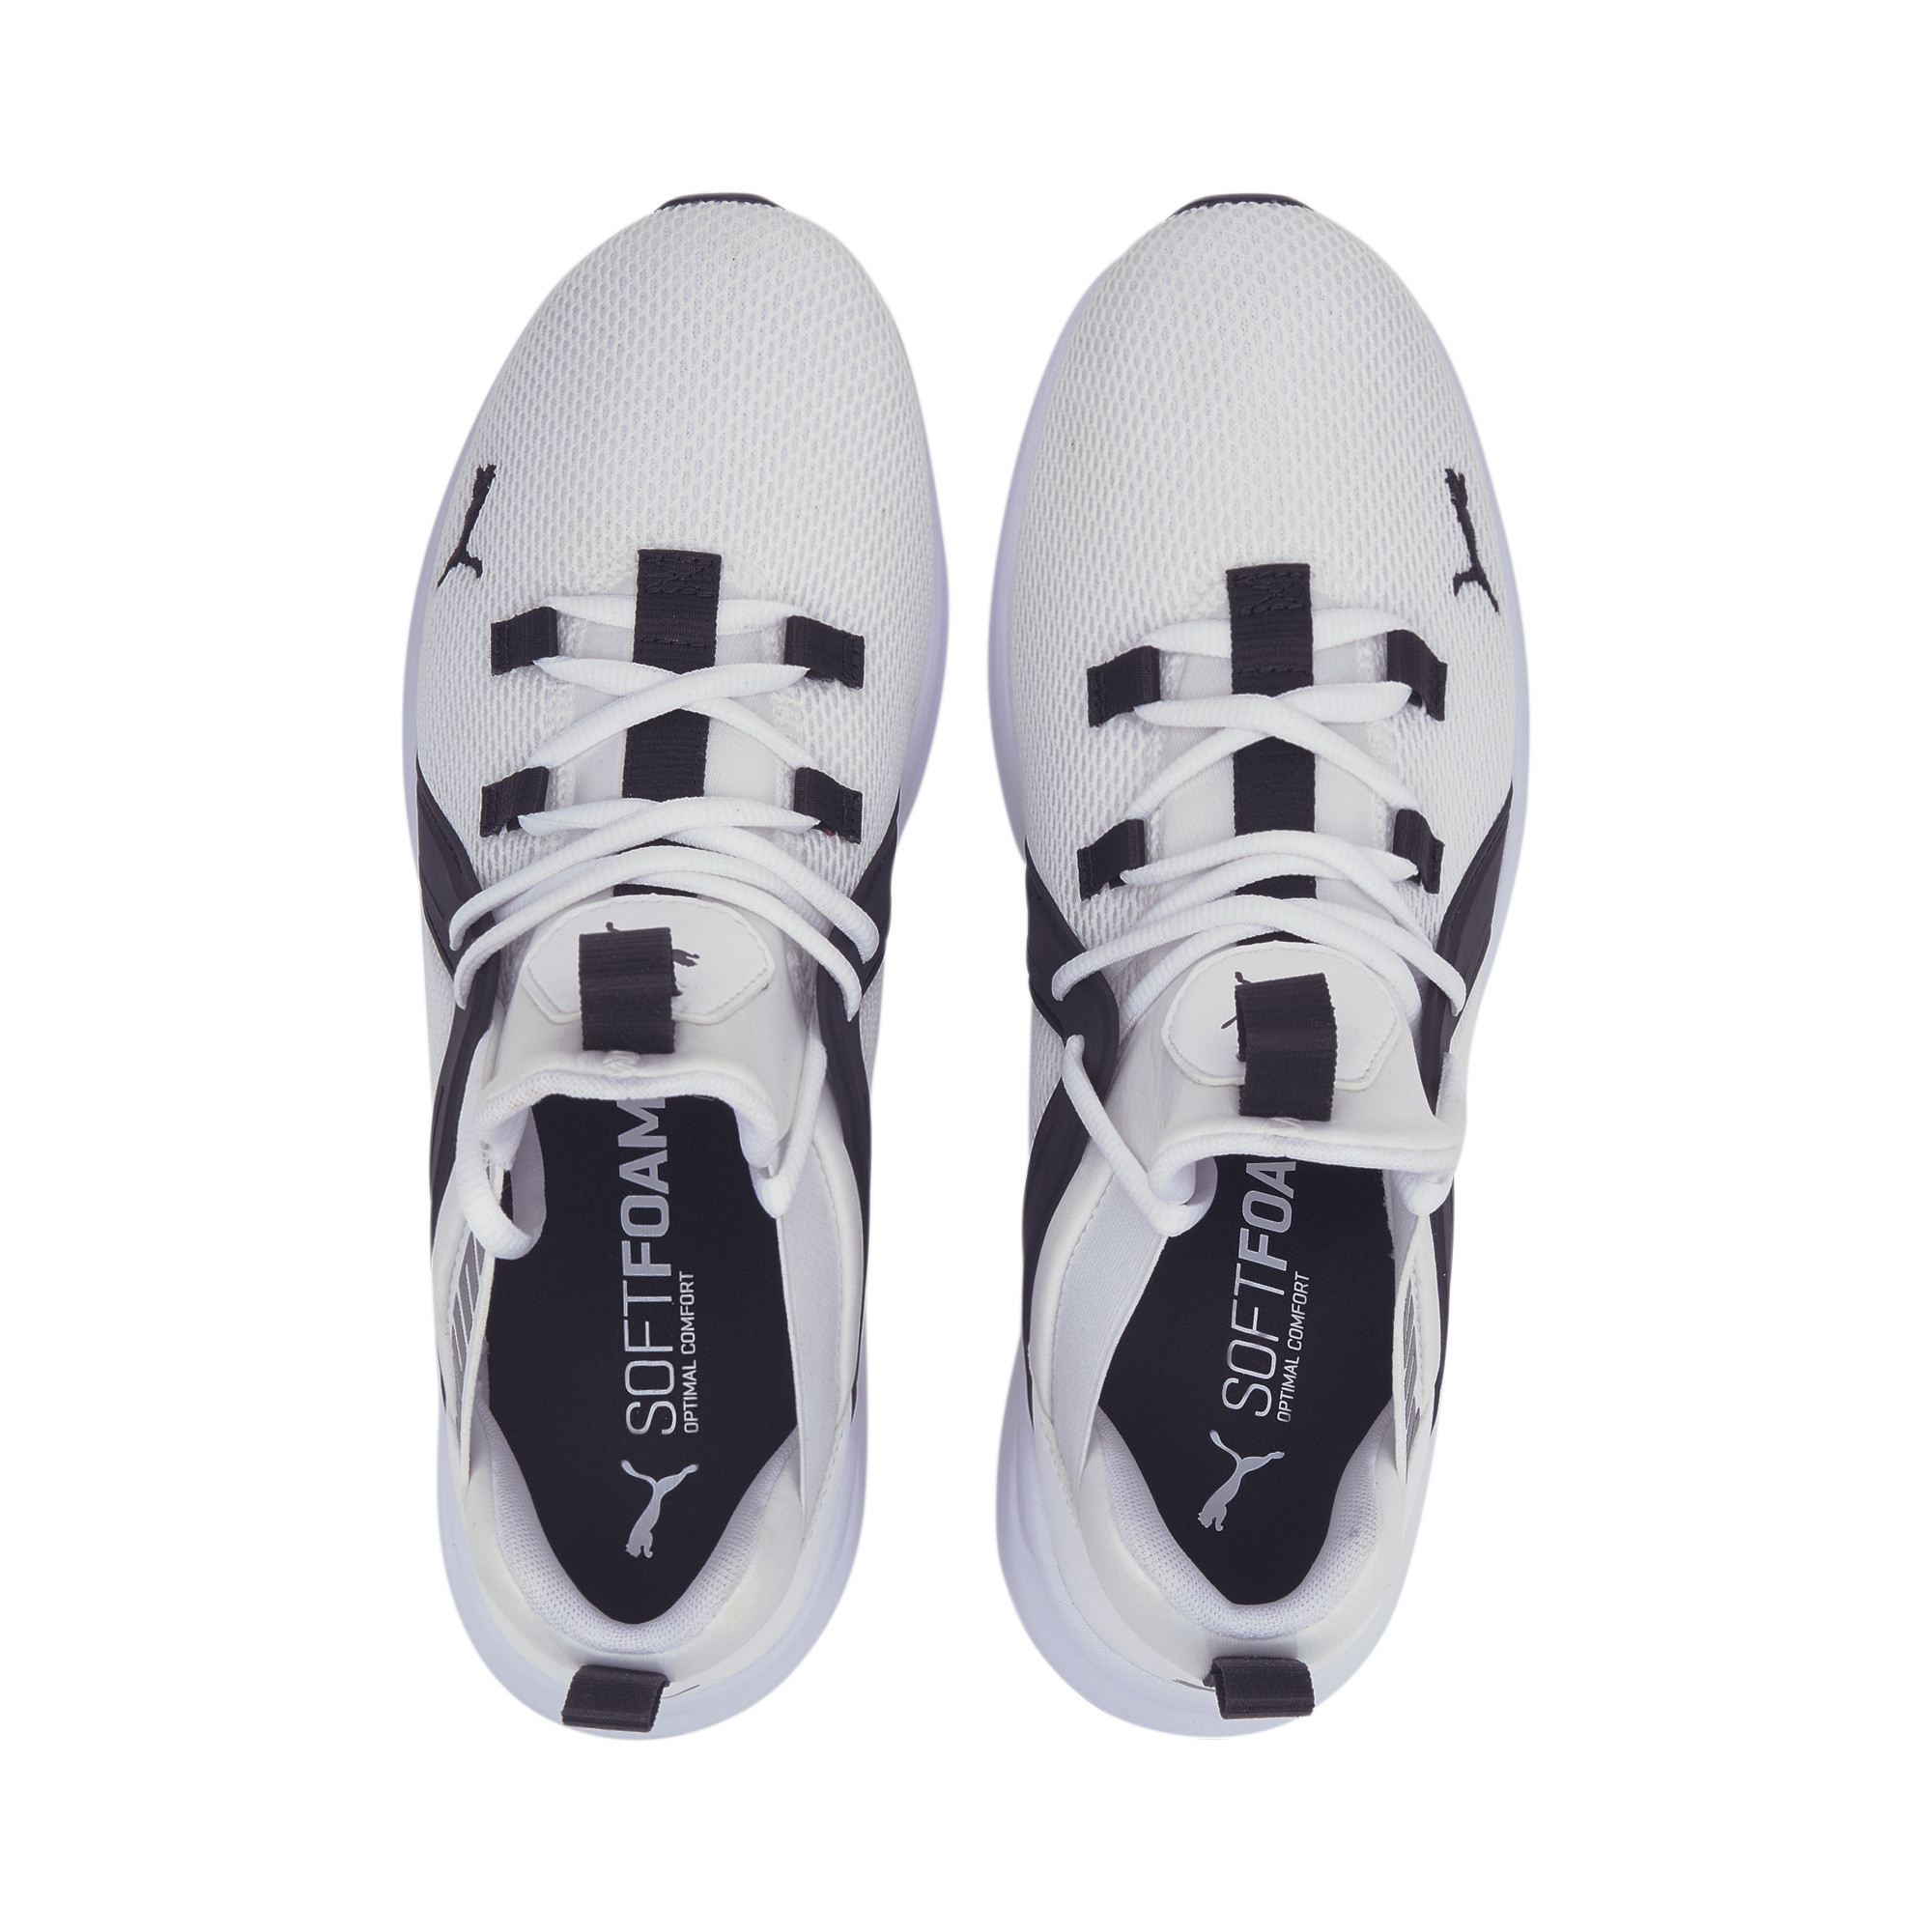 PUMA-Men-039-s-Enzo-2-Training-Shoes thumbnail 41